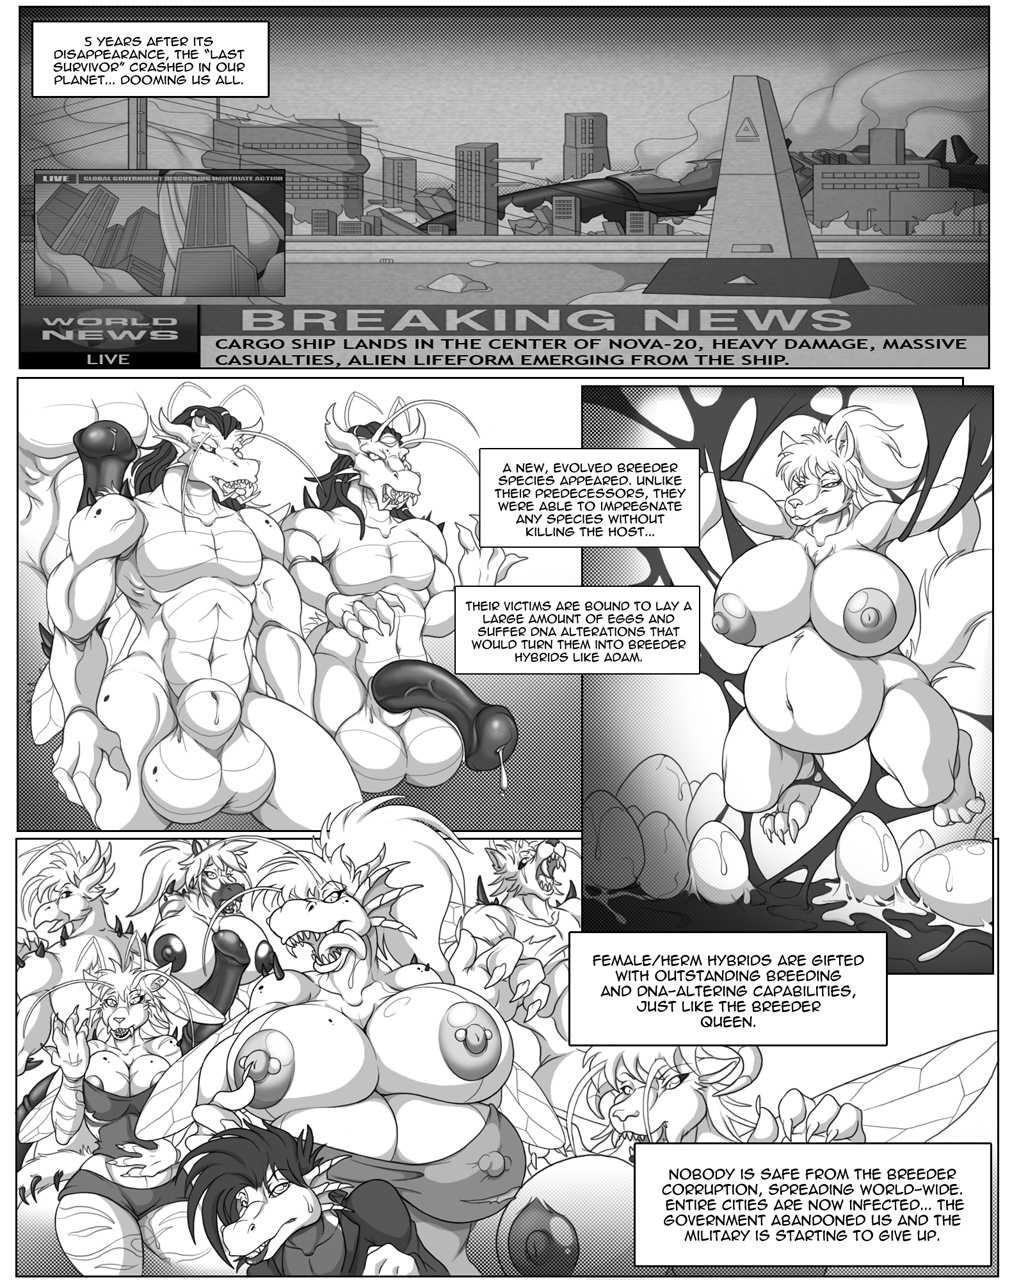 Last Survivor - Episode II porn comics Masturbation, Big Tits, Blowjob, Creampie, Cum Shots, Cum Swallow, Deformed, fingering, Furry, Monster Girls, Pregnant, Straight